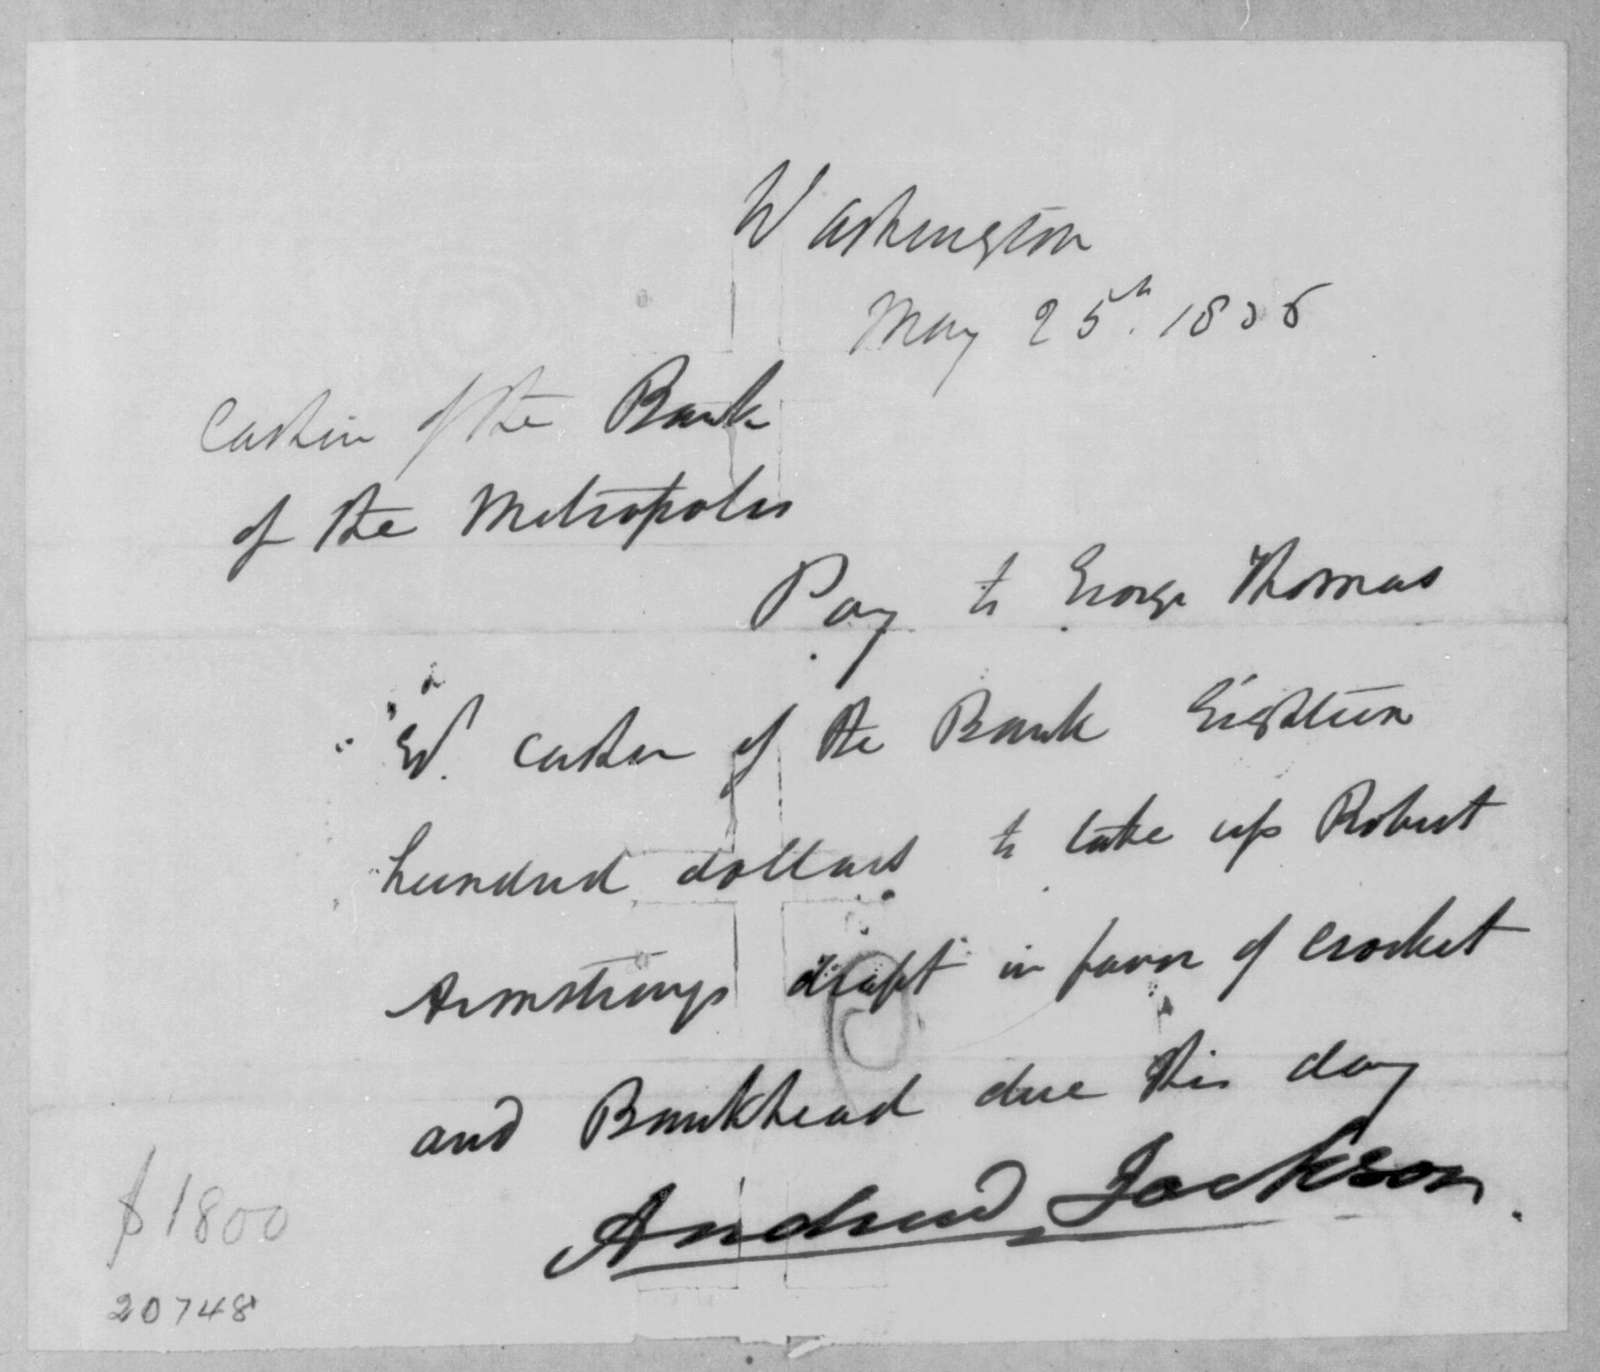 Andrew Jackson to George Thomas, May 25, 1836